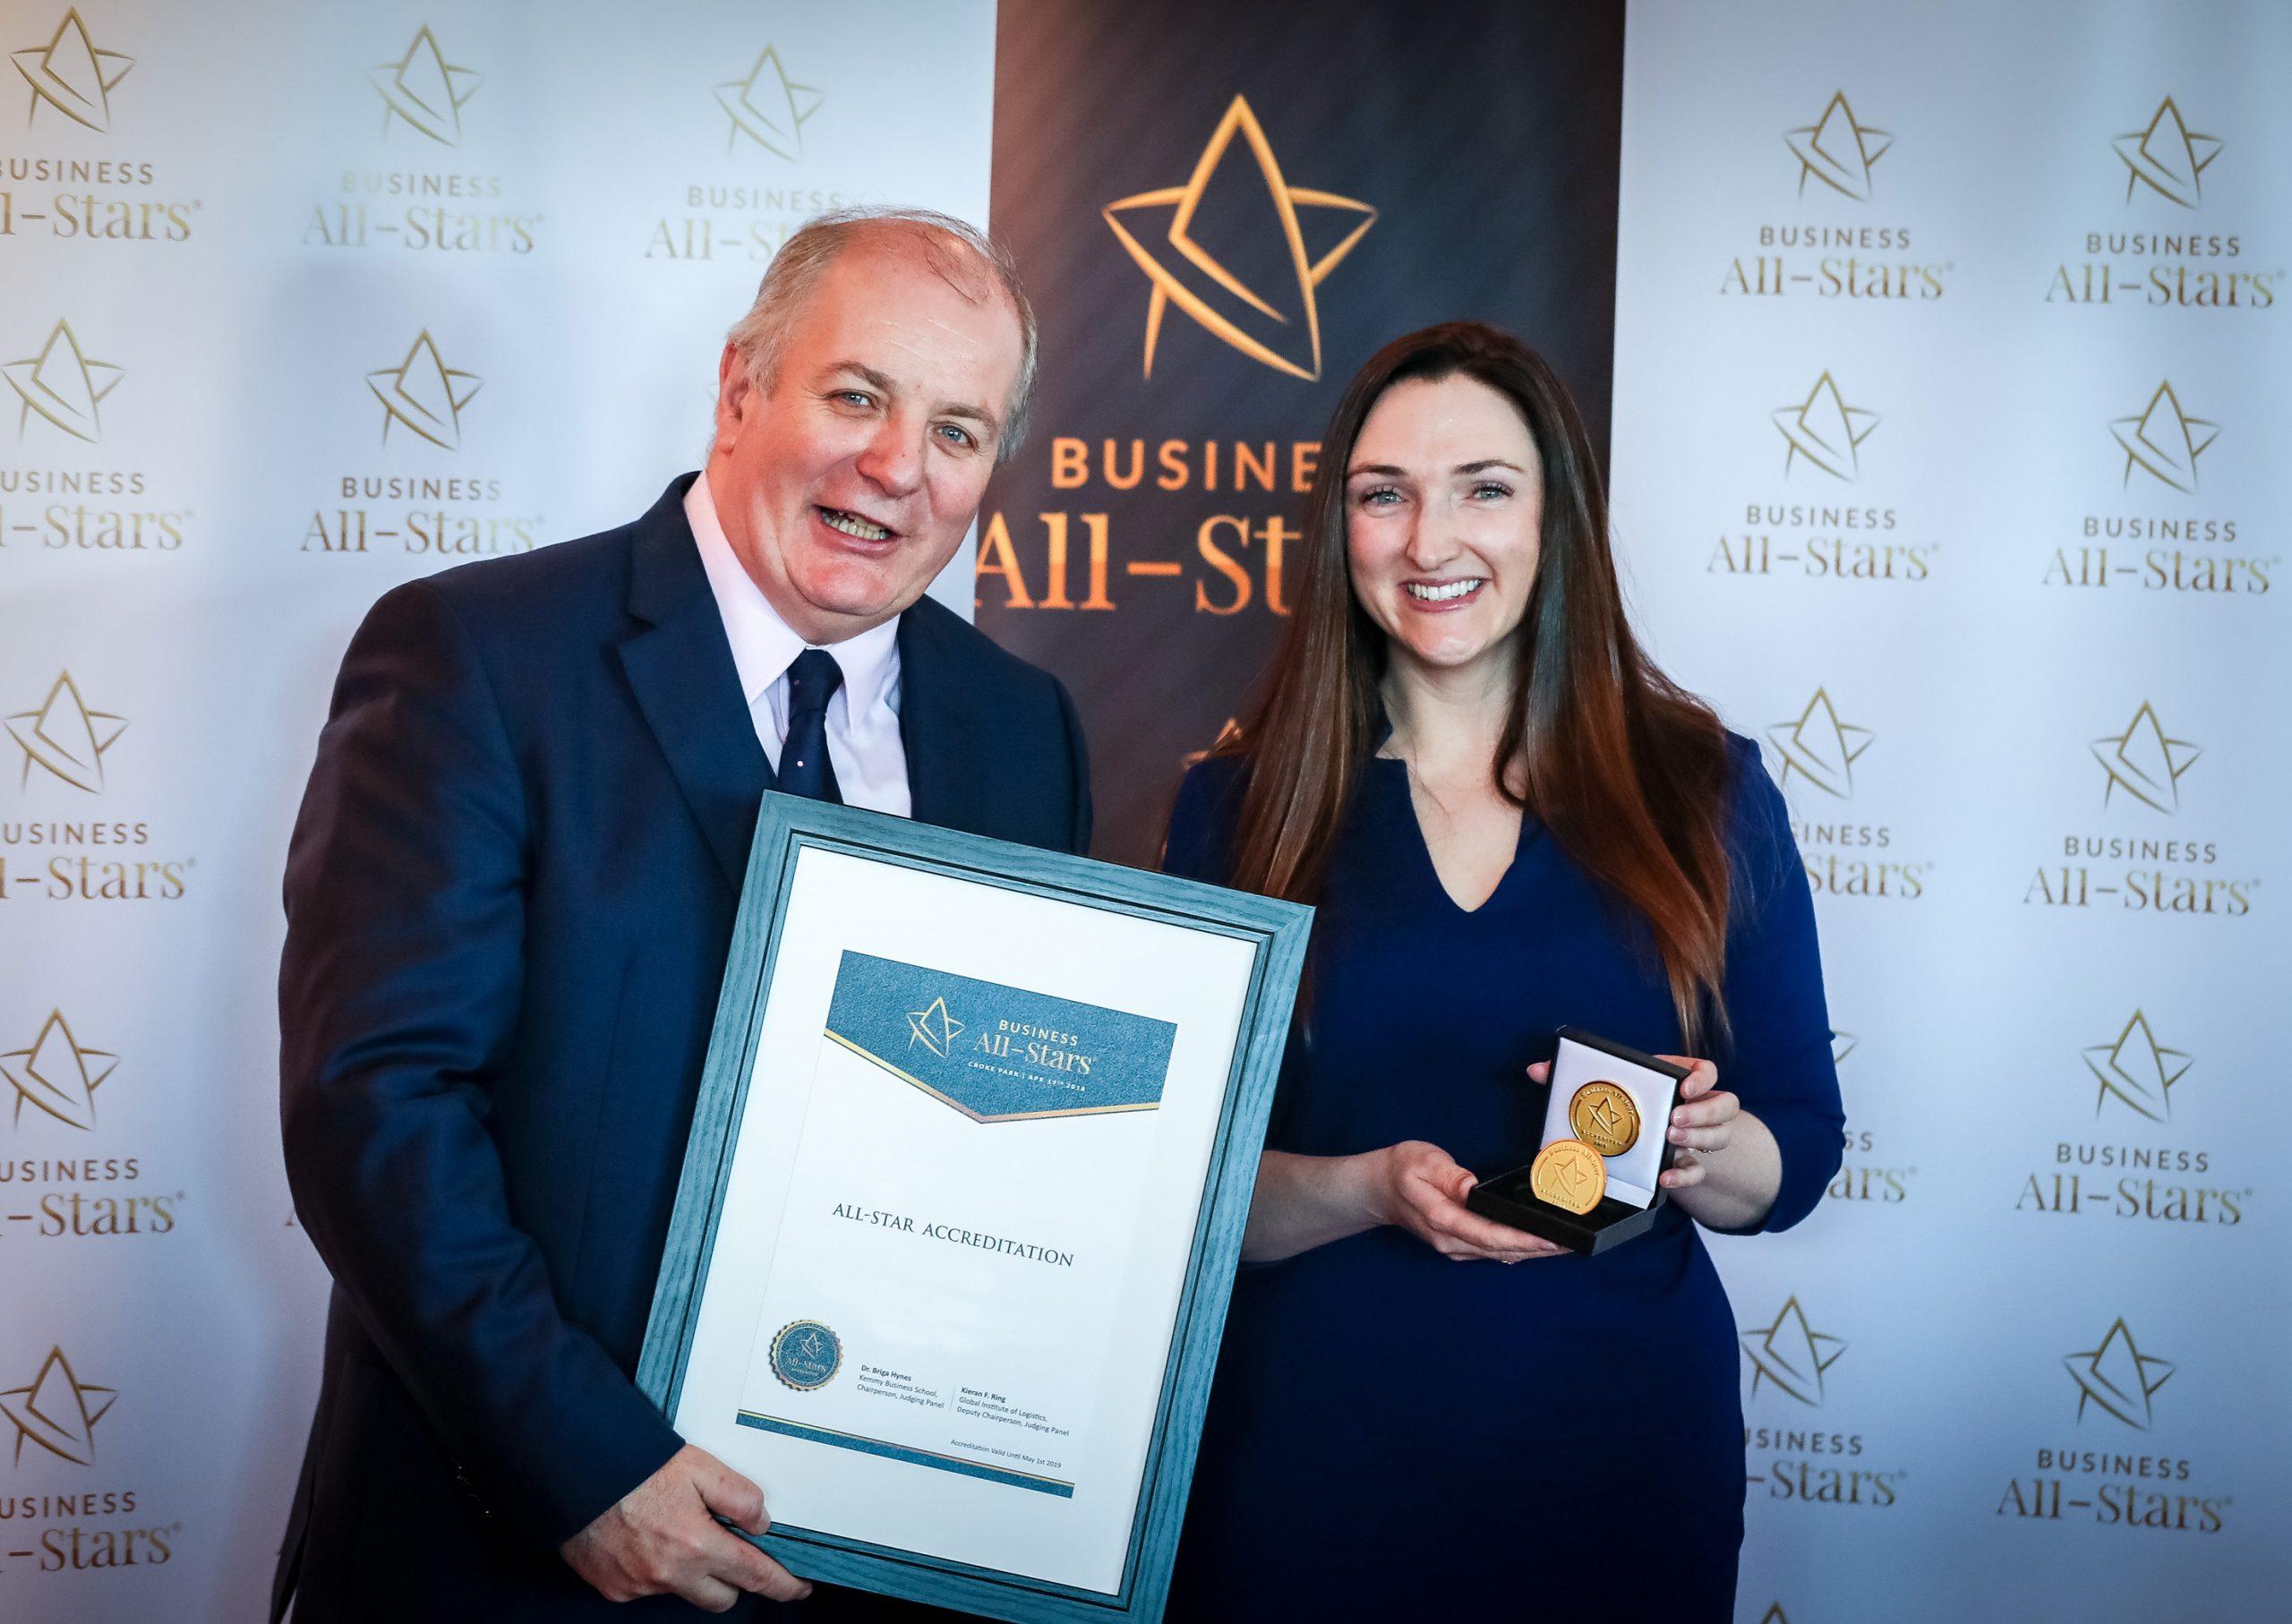 Polar Ice accredited as Business All-Star